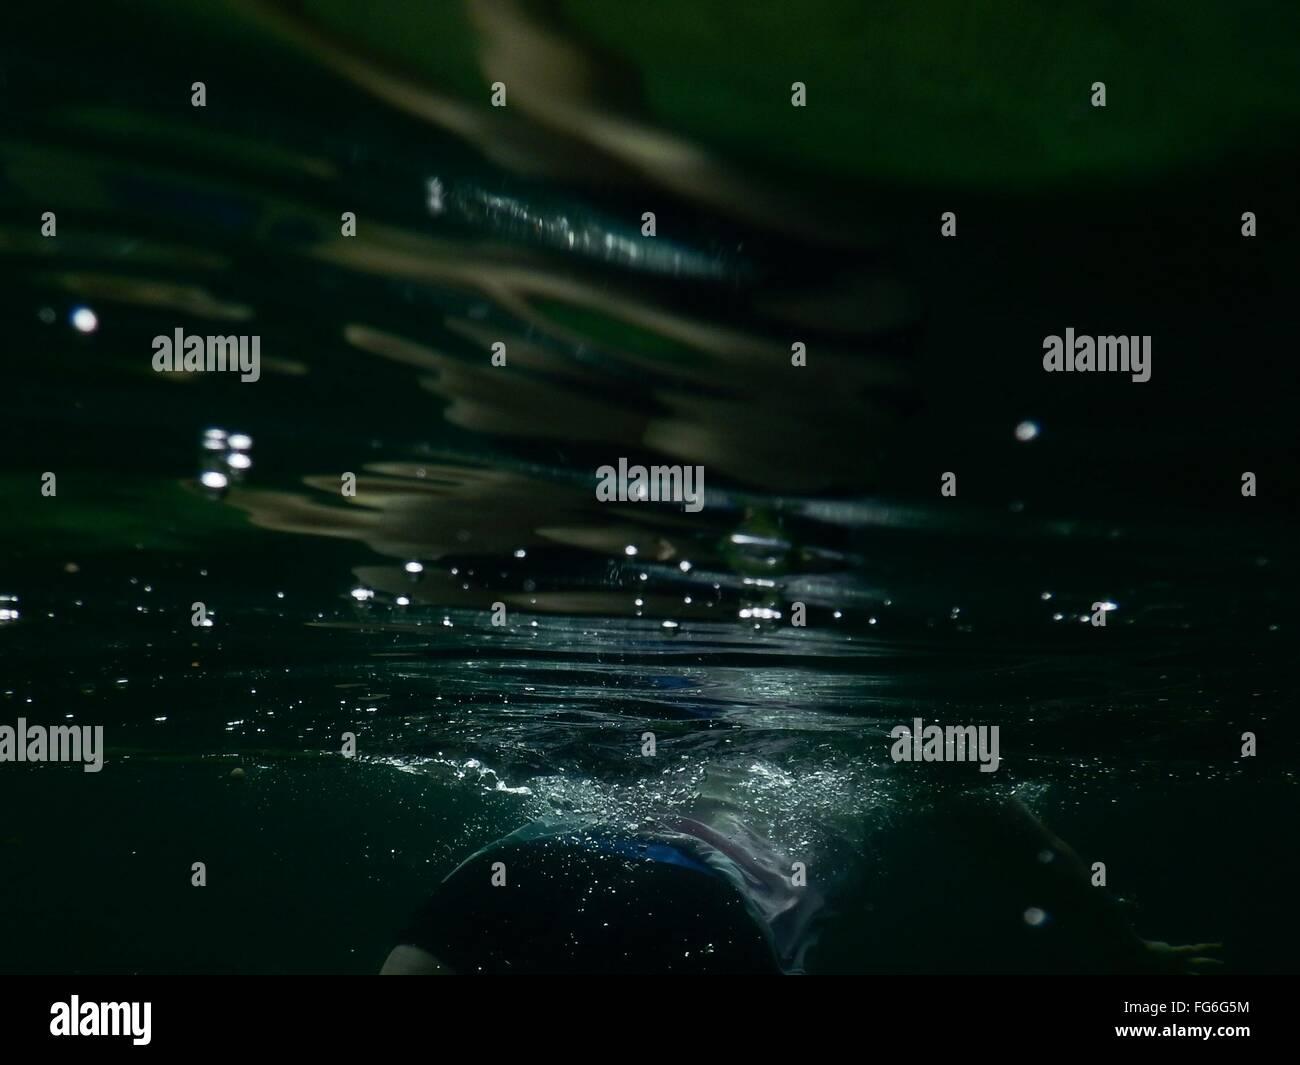 Person Swimming Underwater - Stock Image